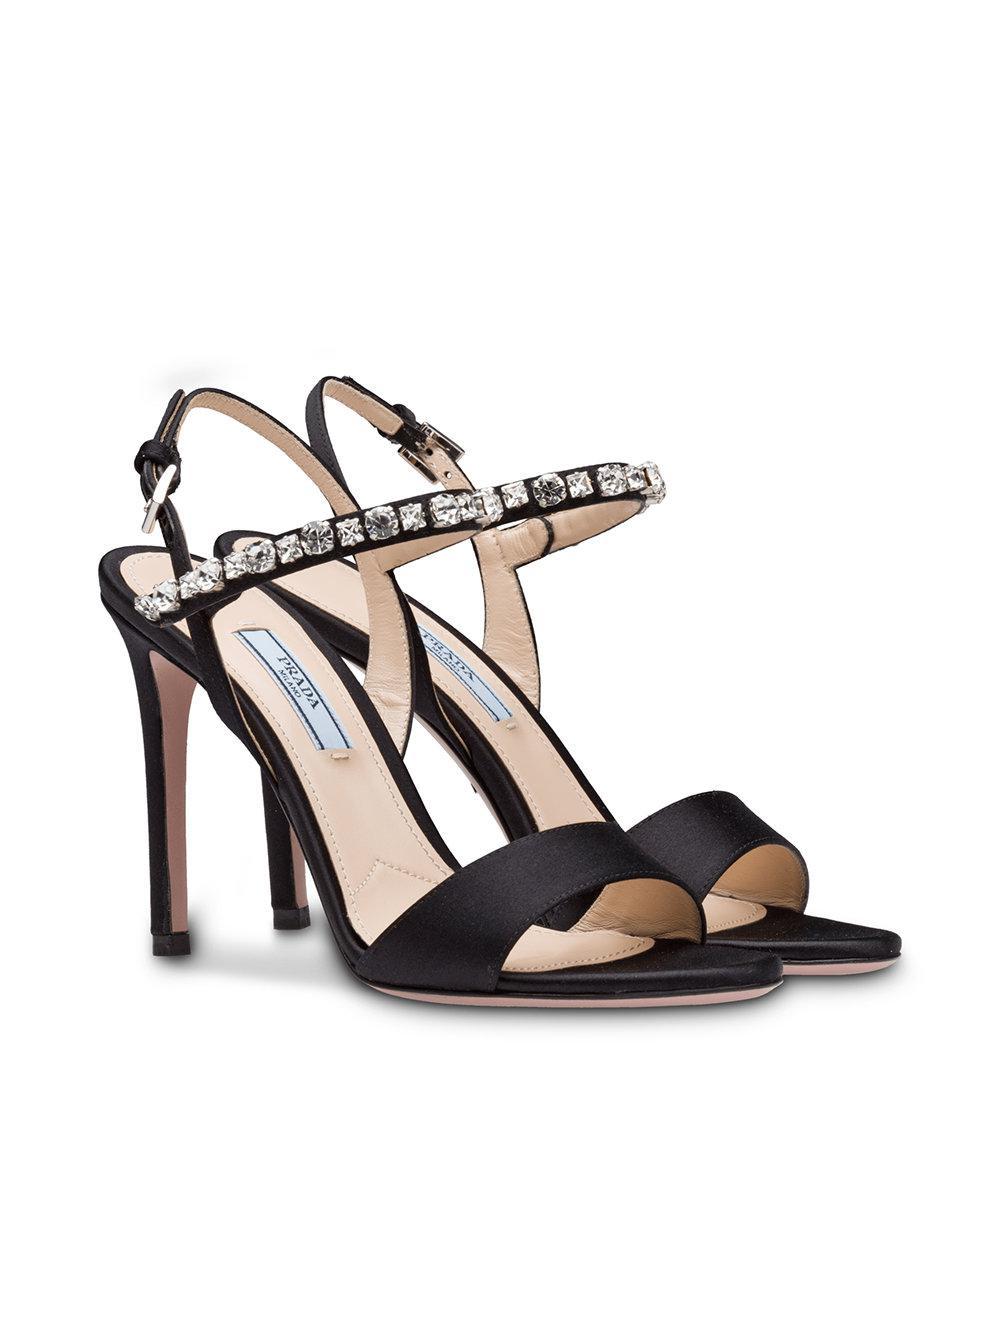 73532027680c Lyst - Prada Crystal Embellished Sandals in Black